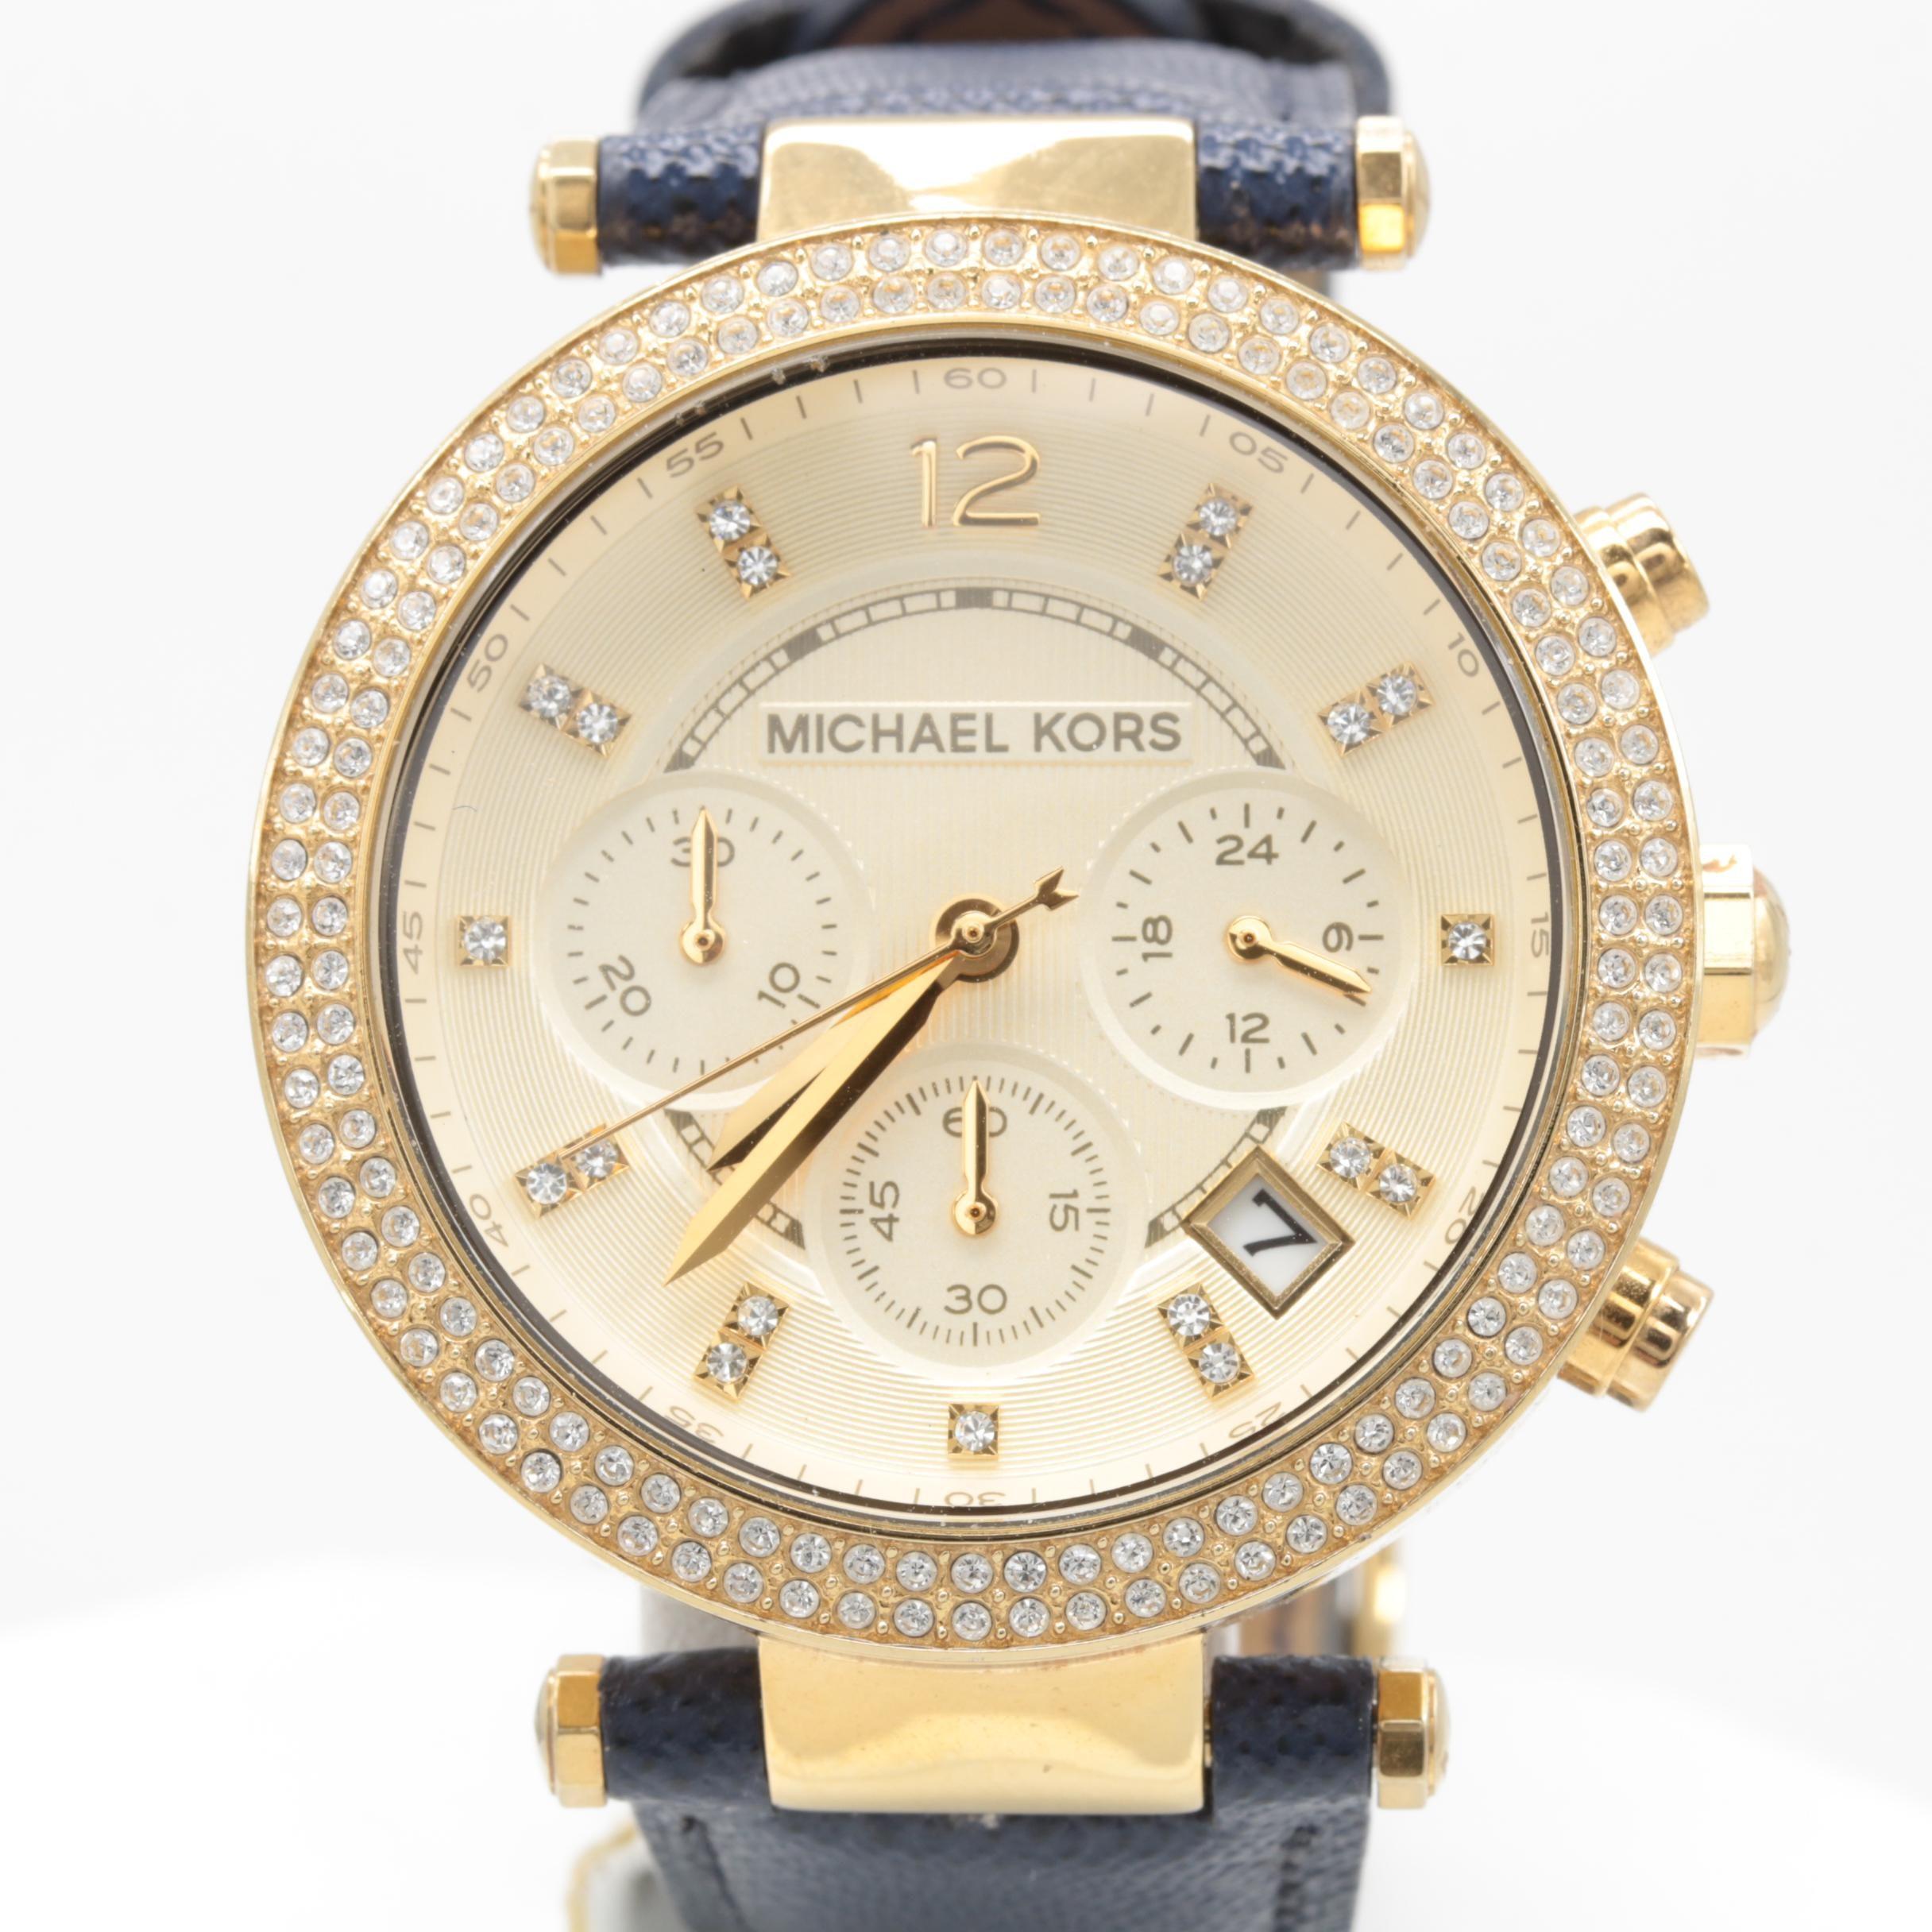 Michael Kors MK-2280 Stainless Steel Chronograph Wristwatch